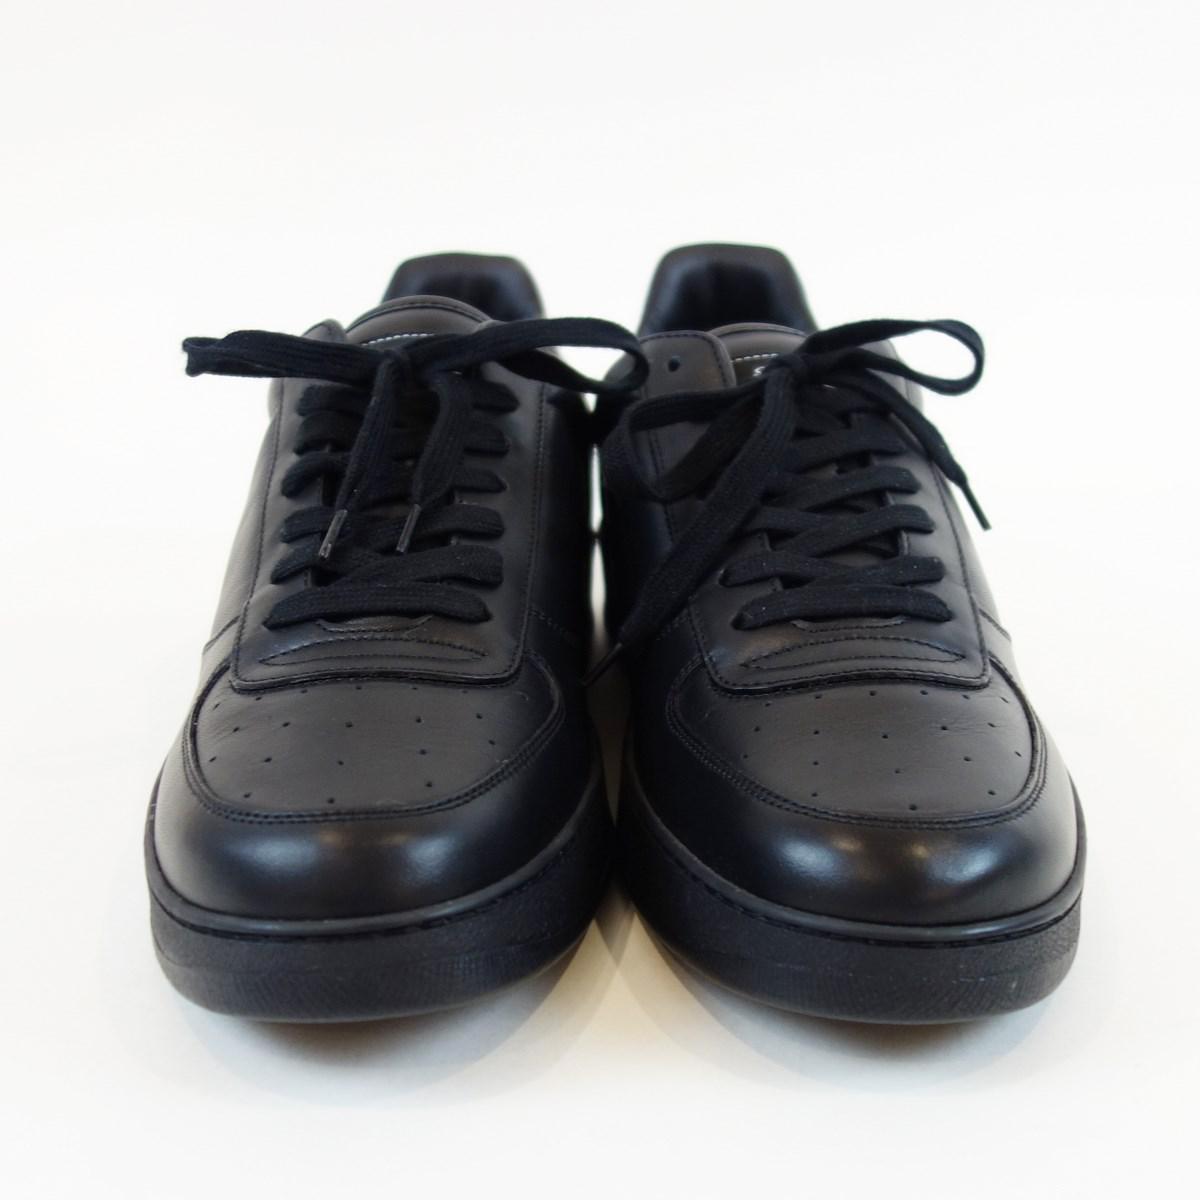 563cfc2e0854 Lyst - Louis Vuitton Rivoli Line Sneaker Size 8 1 2 in Black for Men